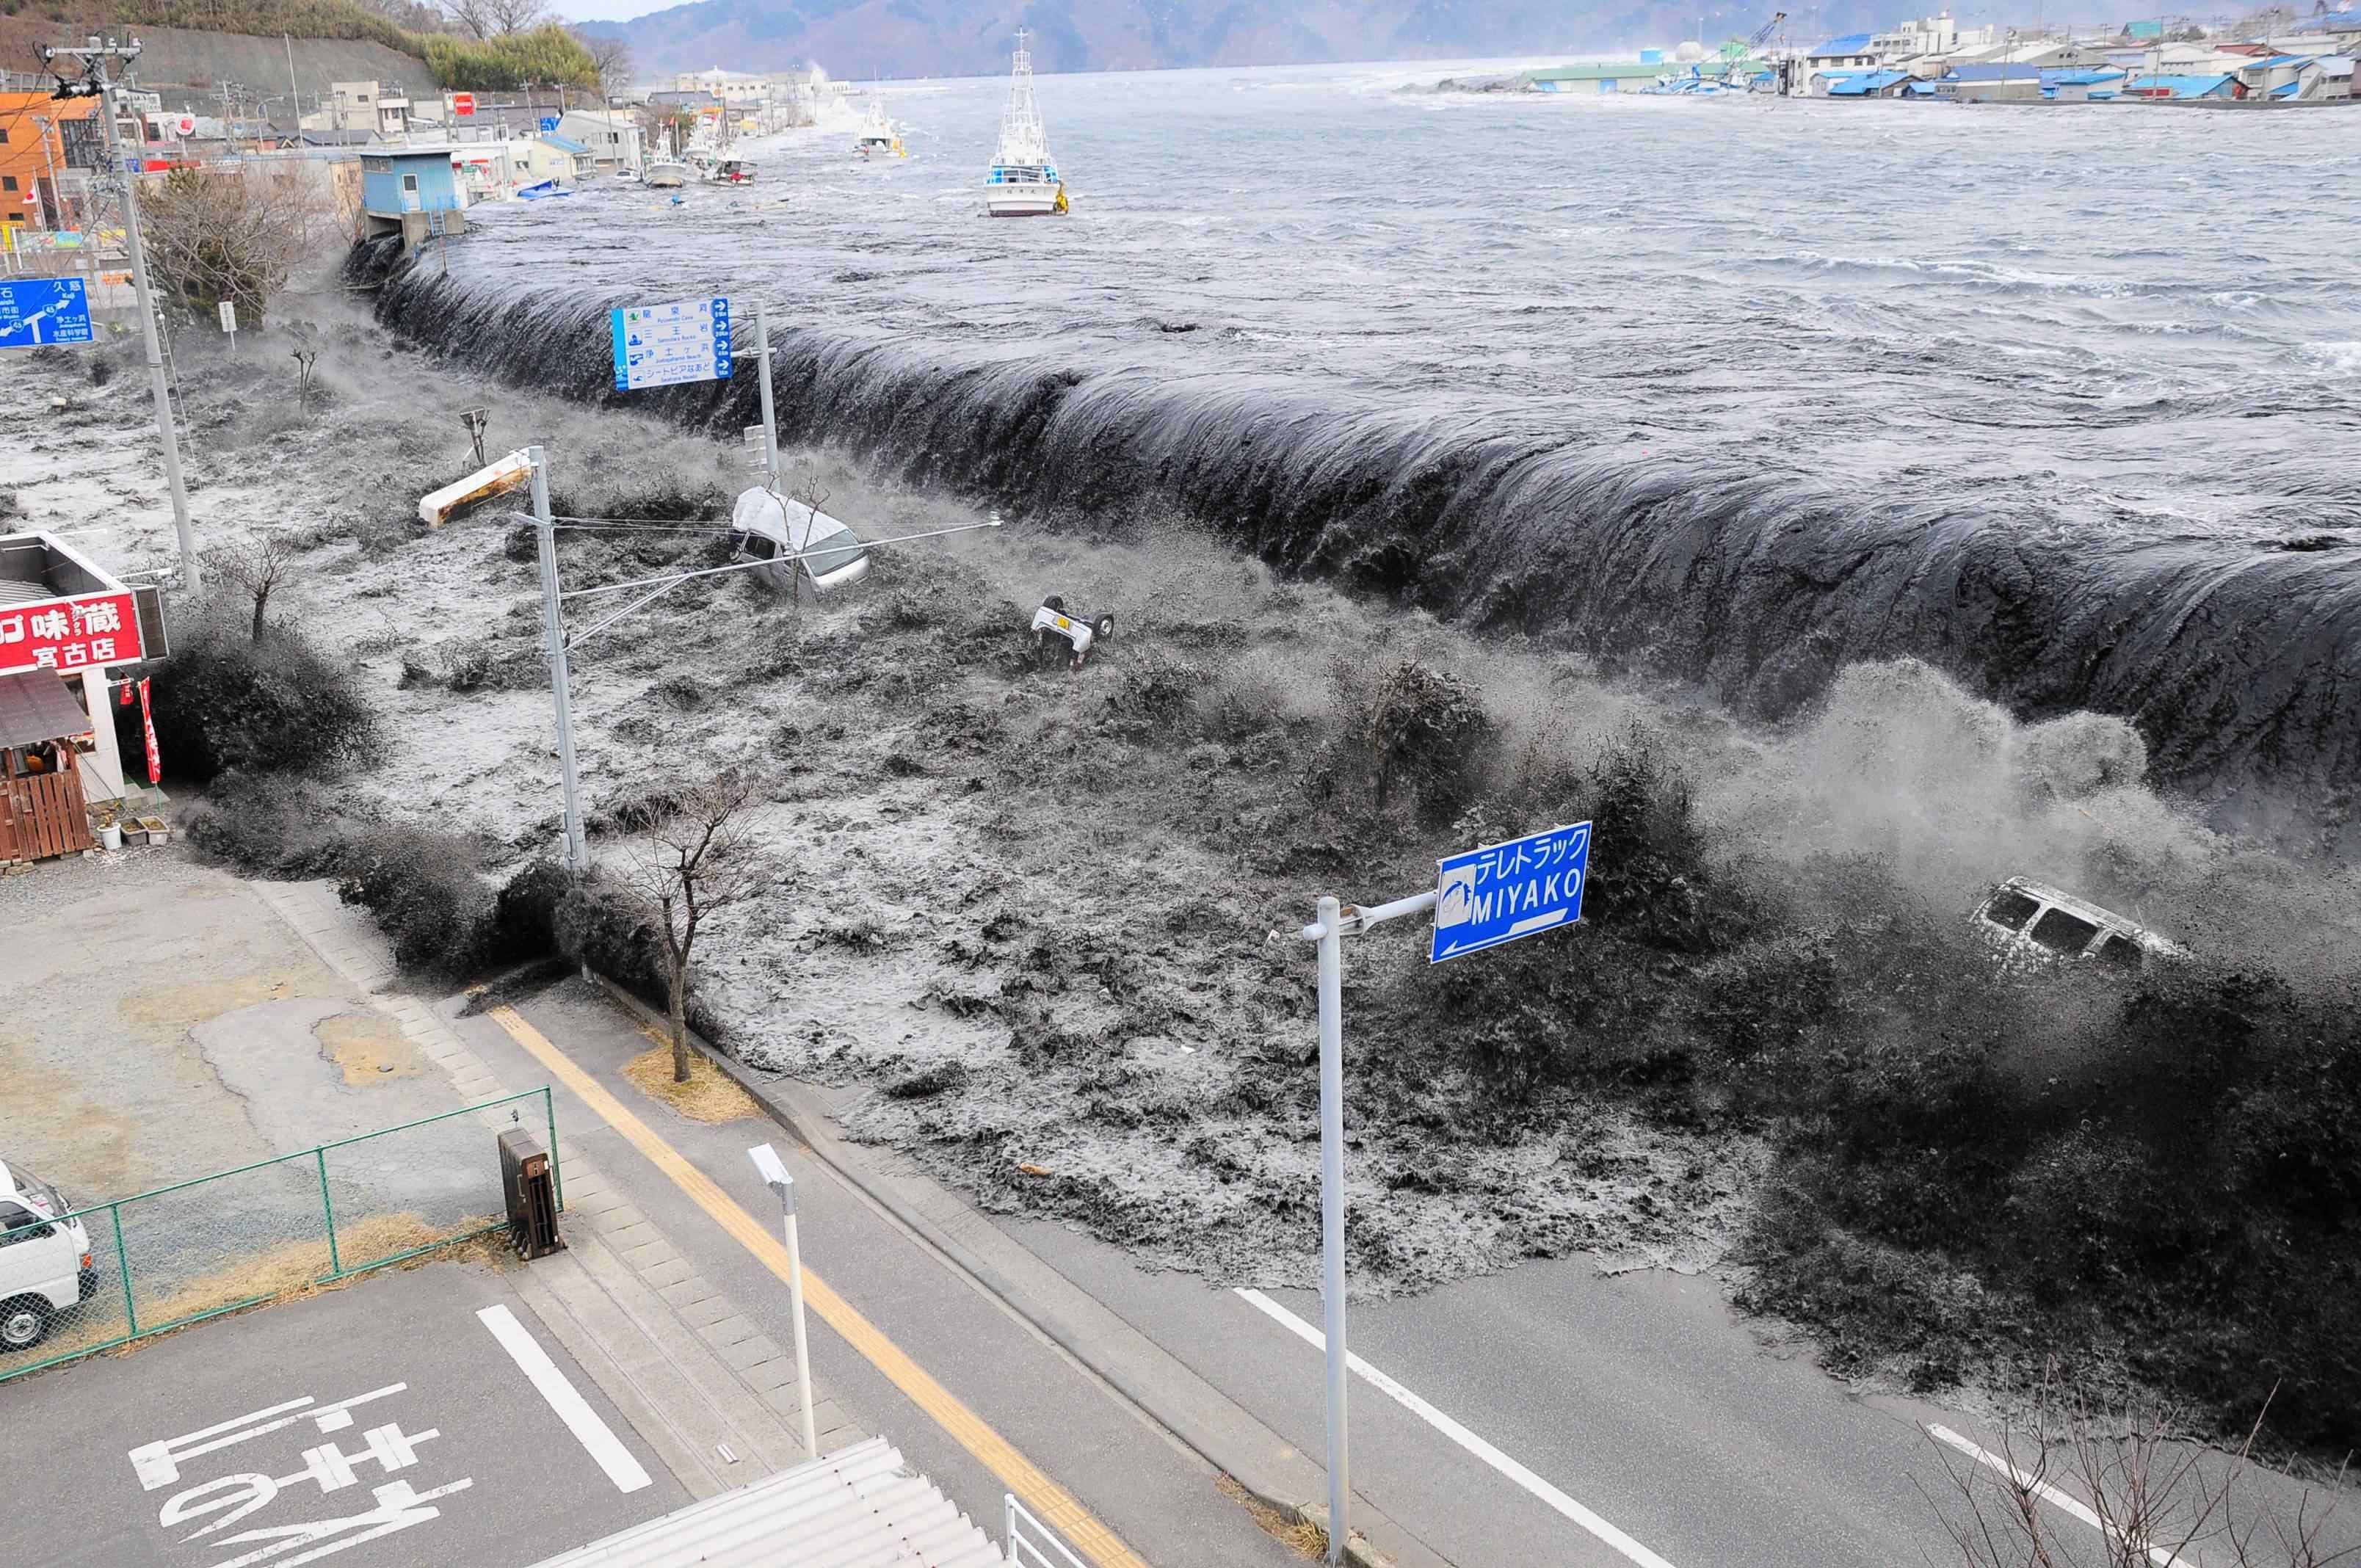 Tsunami En Chile Que Dejo Entre 60 Y 200 Muertos Este Catástrofe Natural Iba A 700 Kilómetros Por Hora Tsunami Waves Japan Earthquake Tsunami